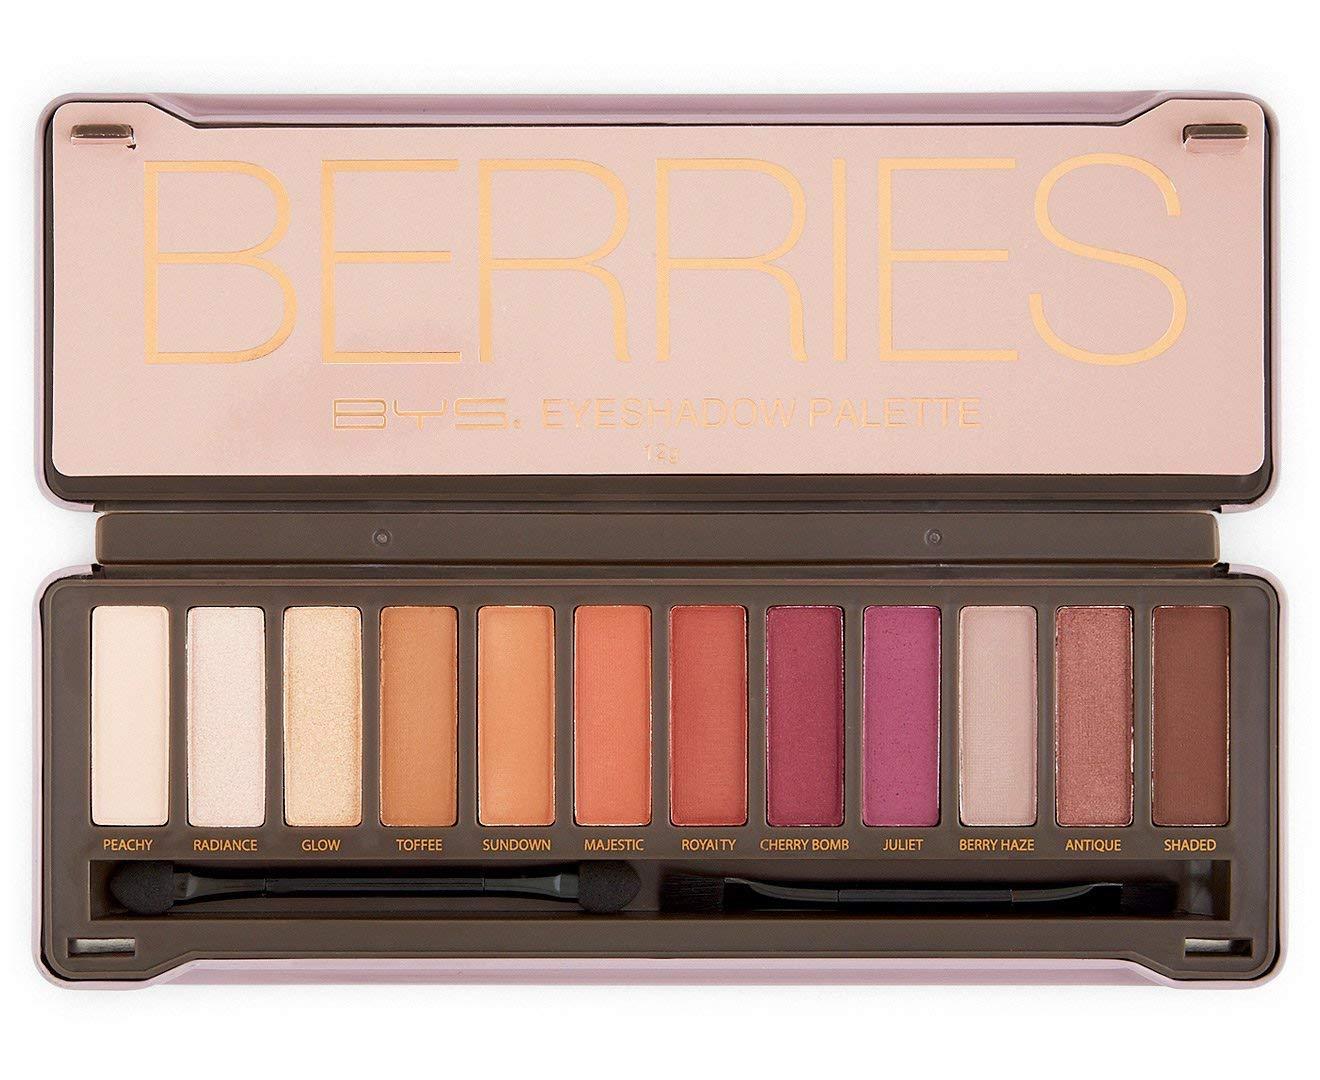 BYS Berries Eyeshadow Palette Tin with Mirror Applicator 12 Matte & Metallic Shades